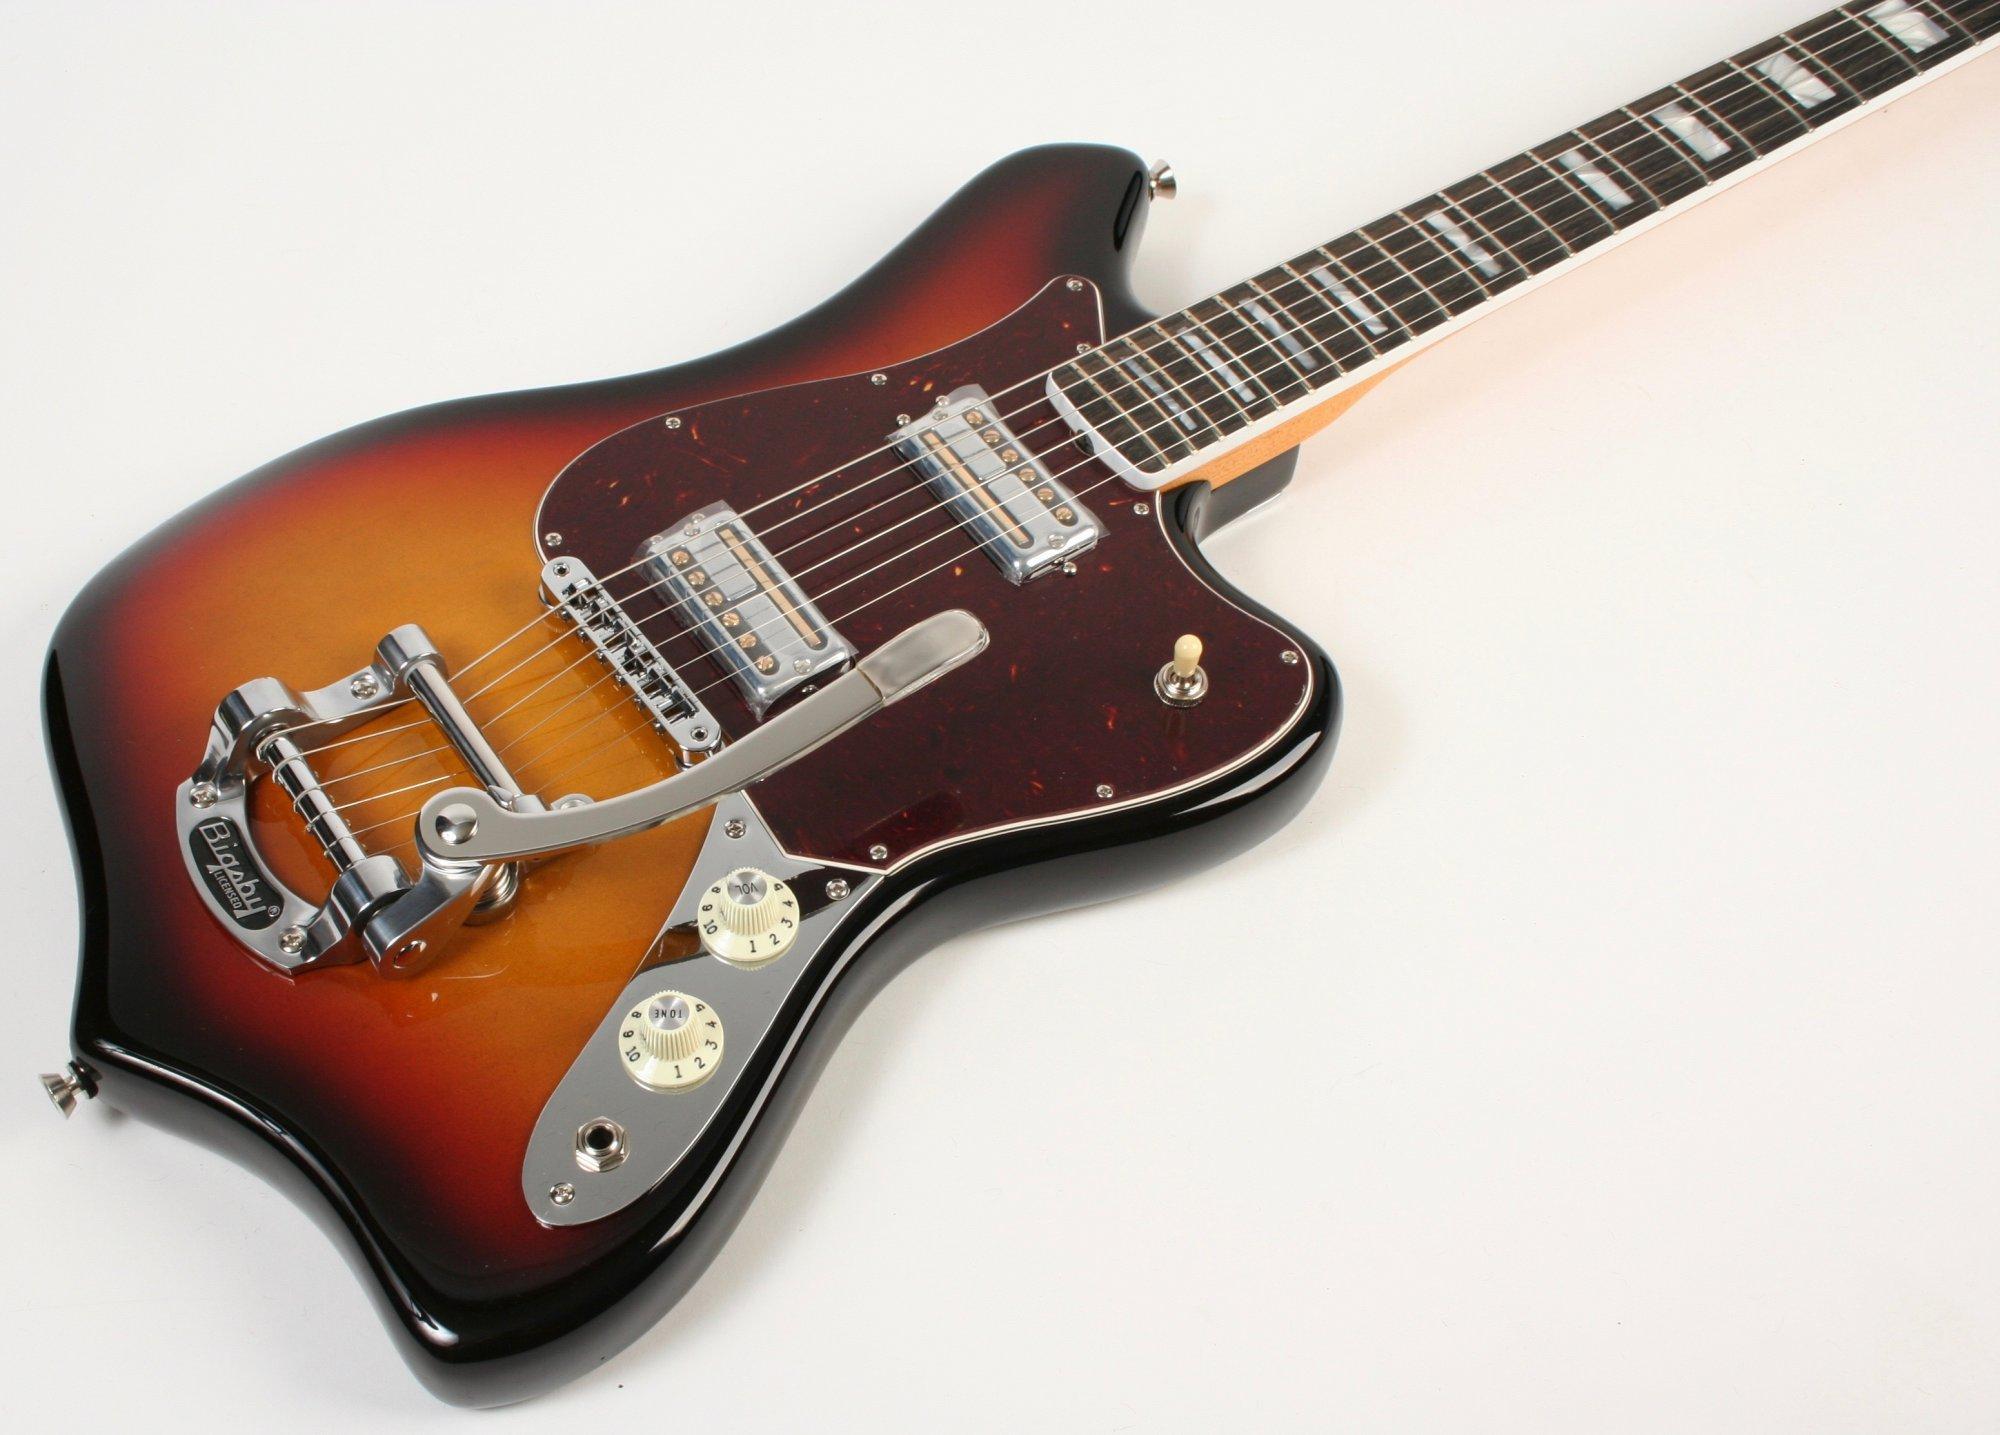 Fender Parallel Univers 2 Maverick Ultraburst